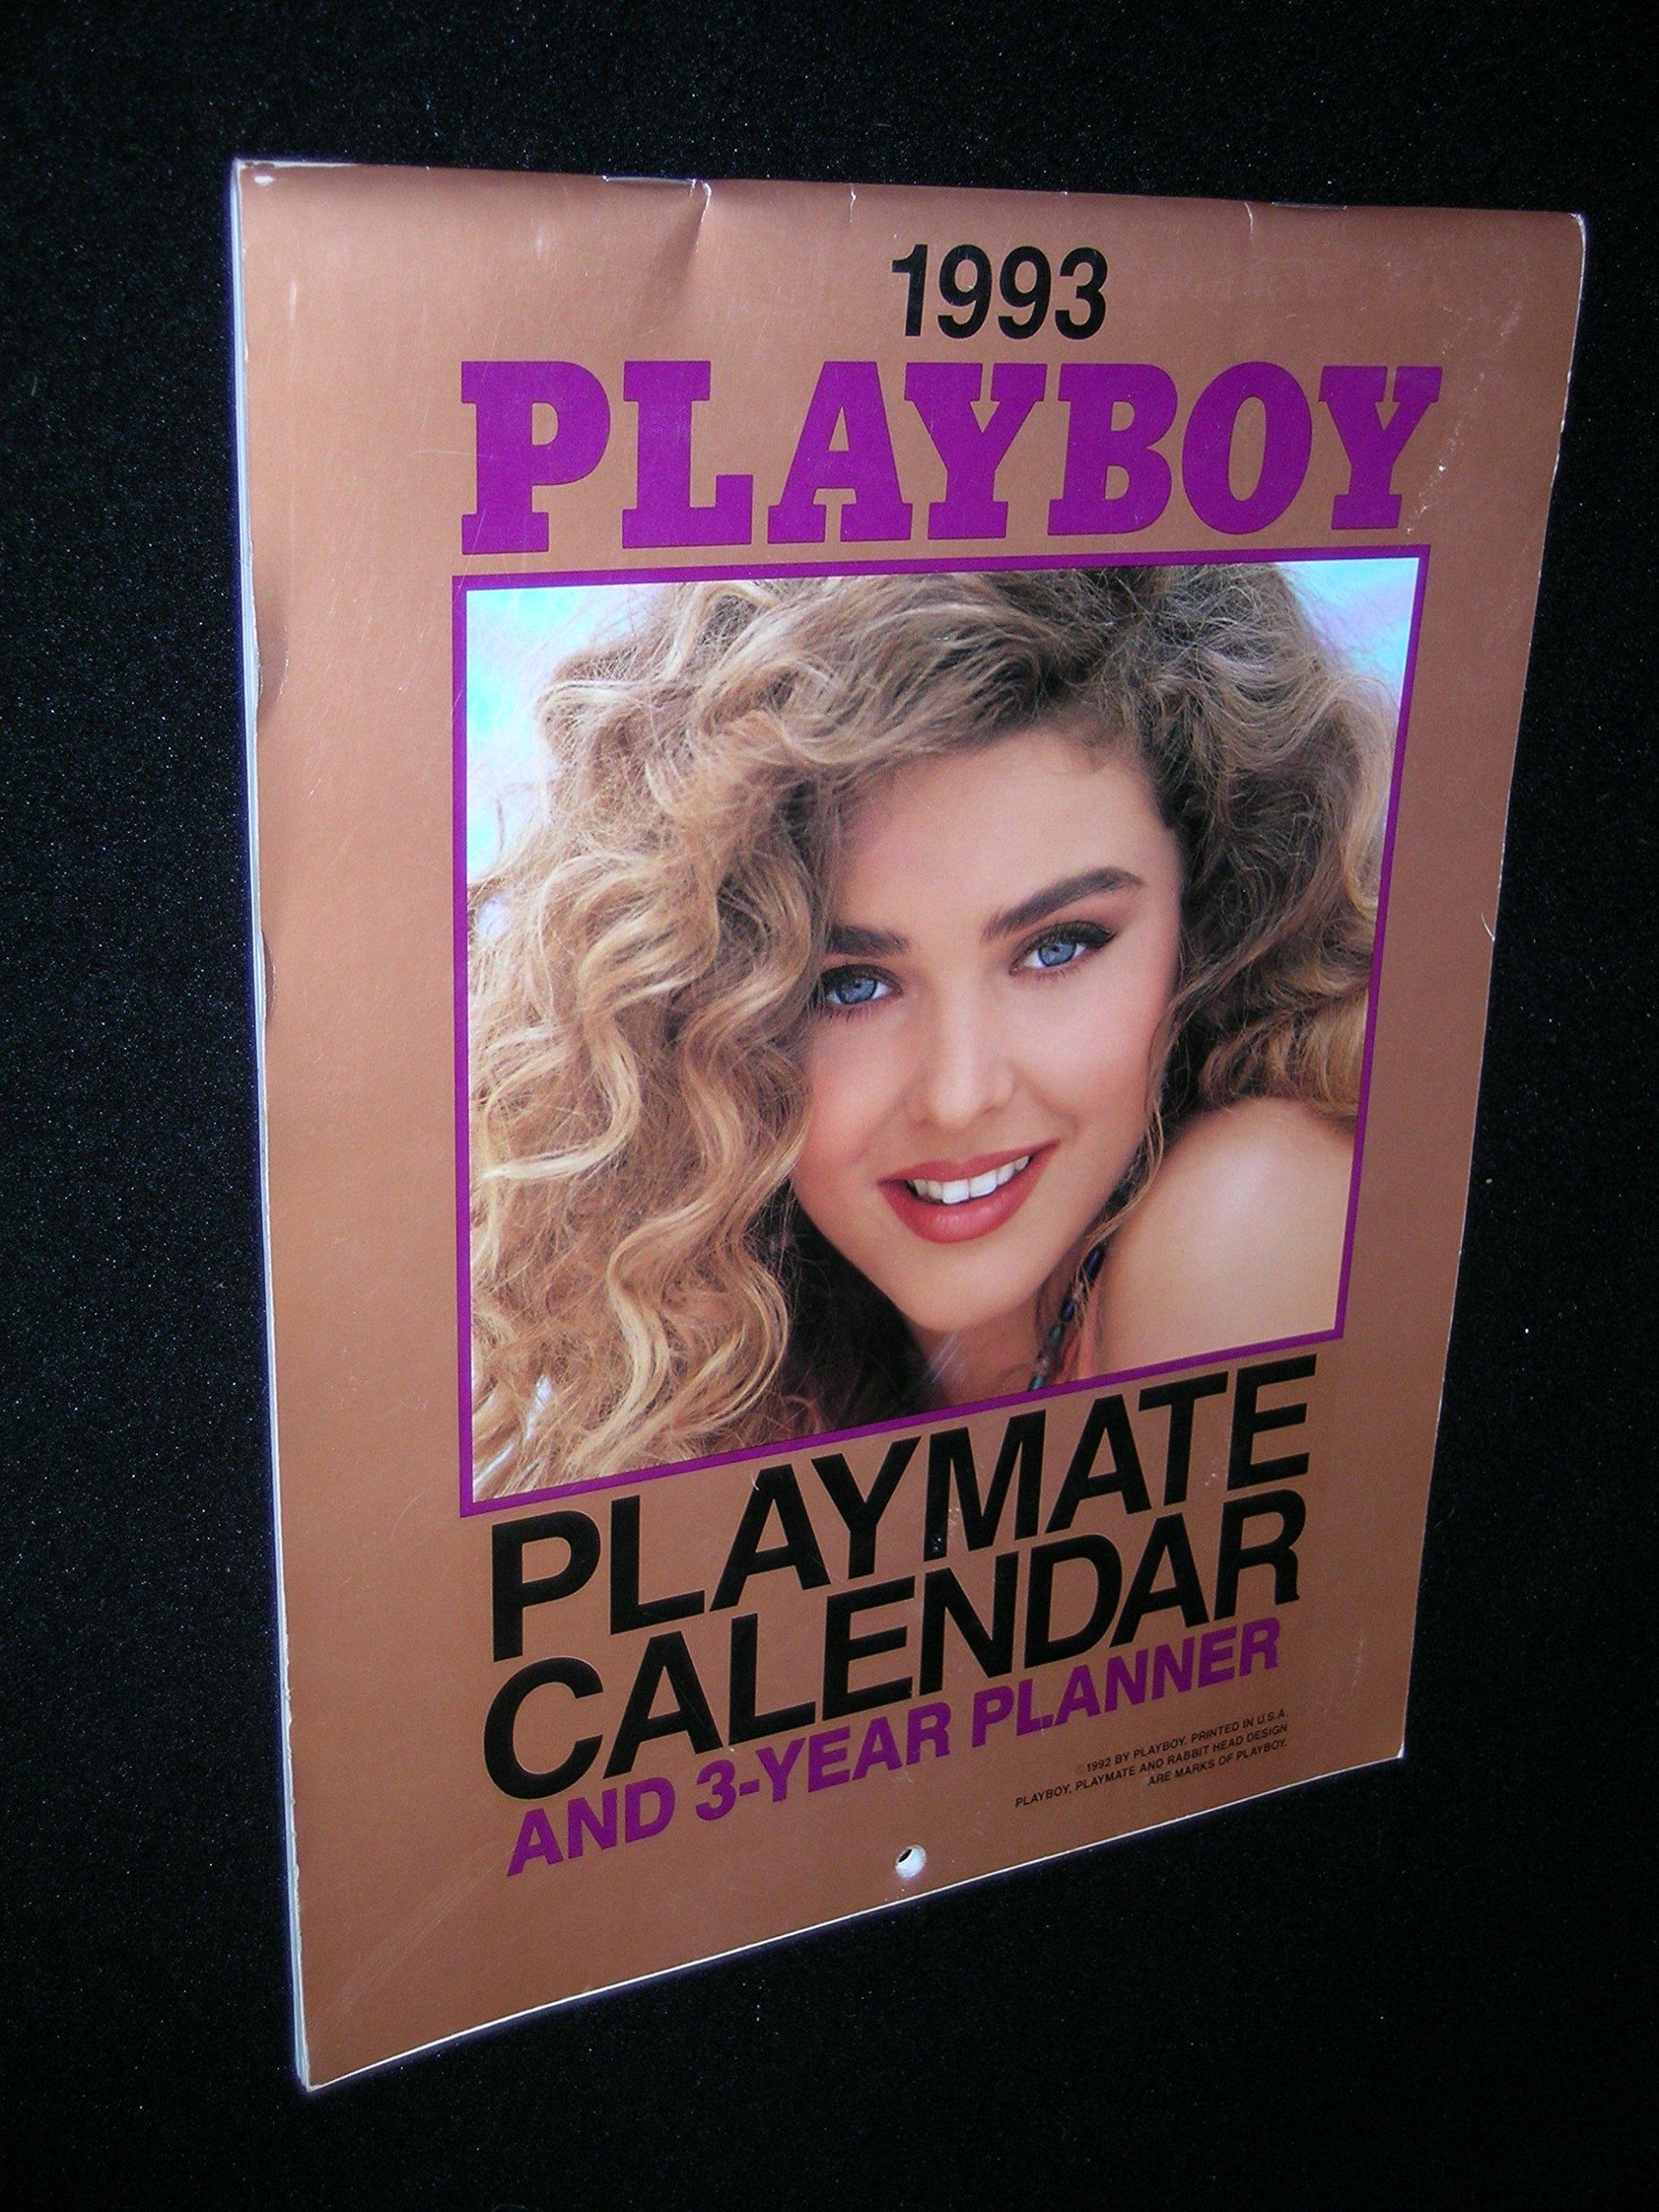 Consider, what nude playboy playmate calendar found